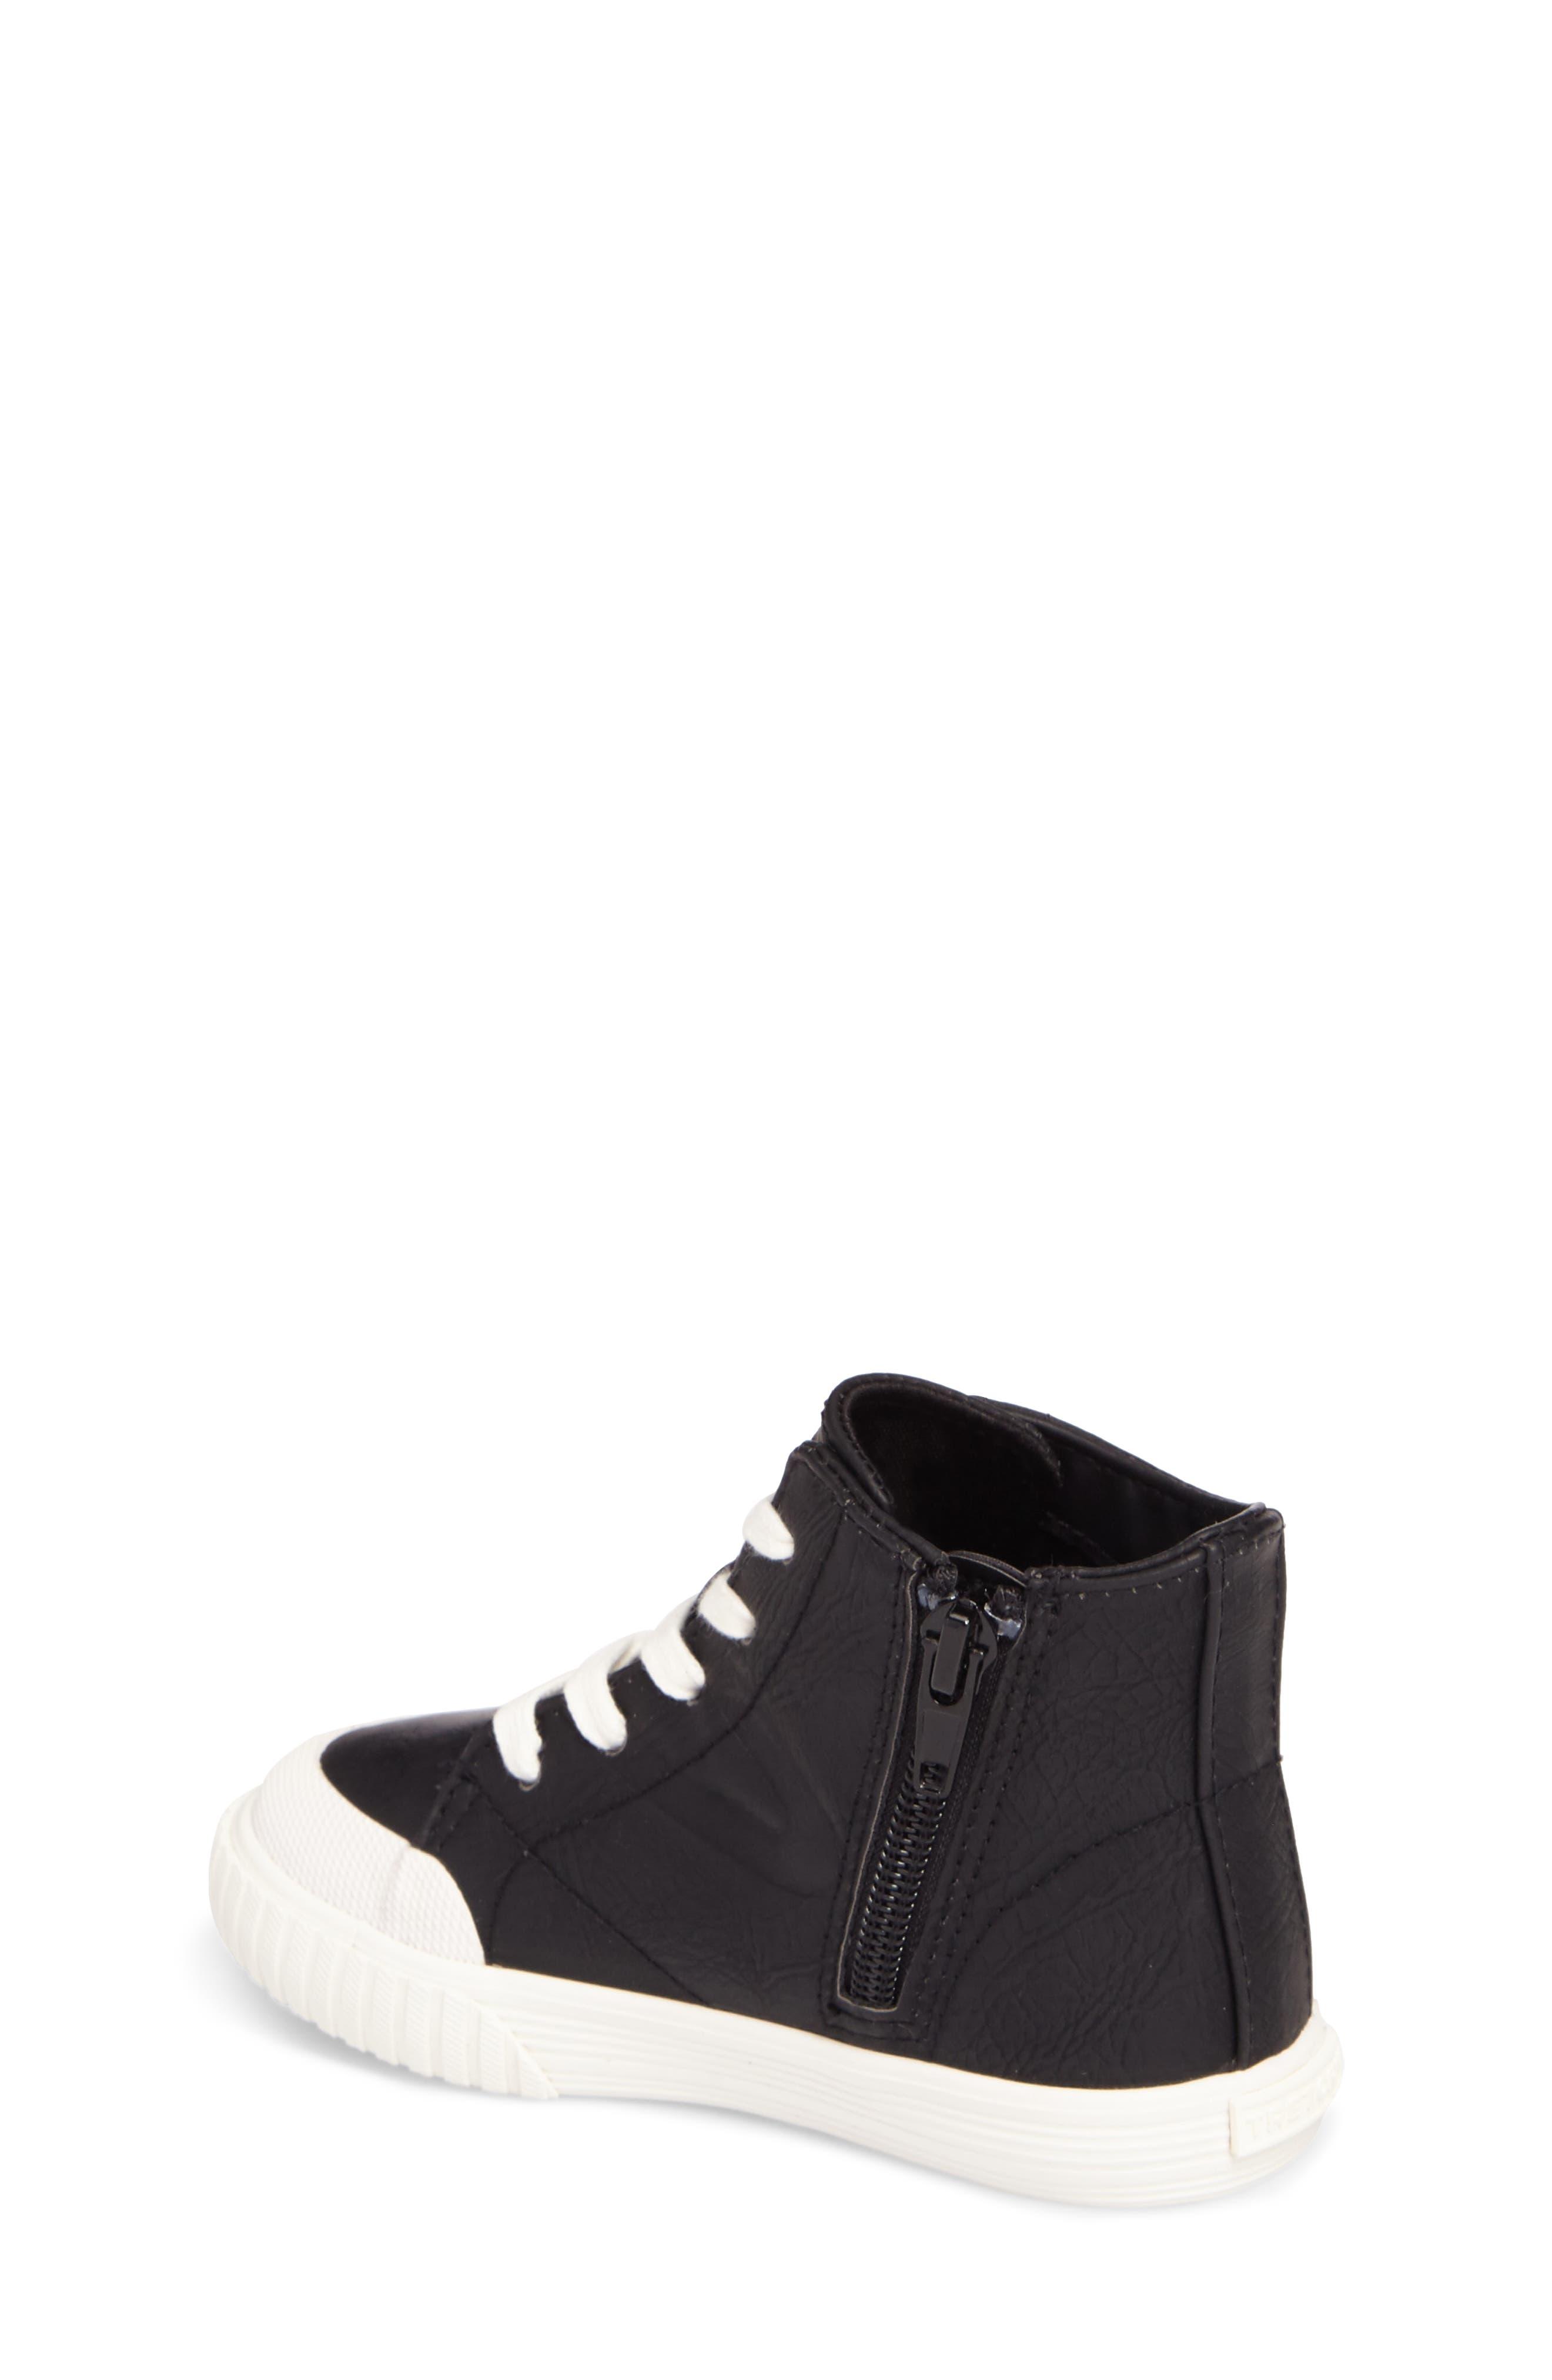 Marley High Top Sneaker,                             Alternate thumbnail 4, color,